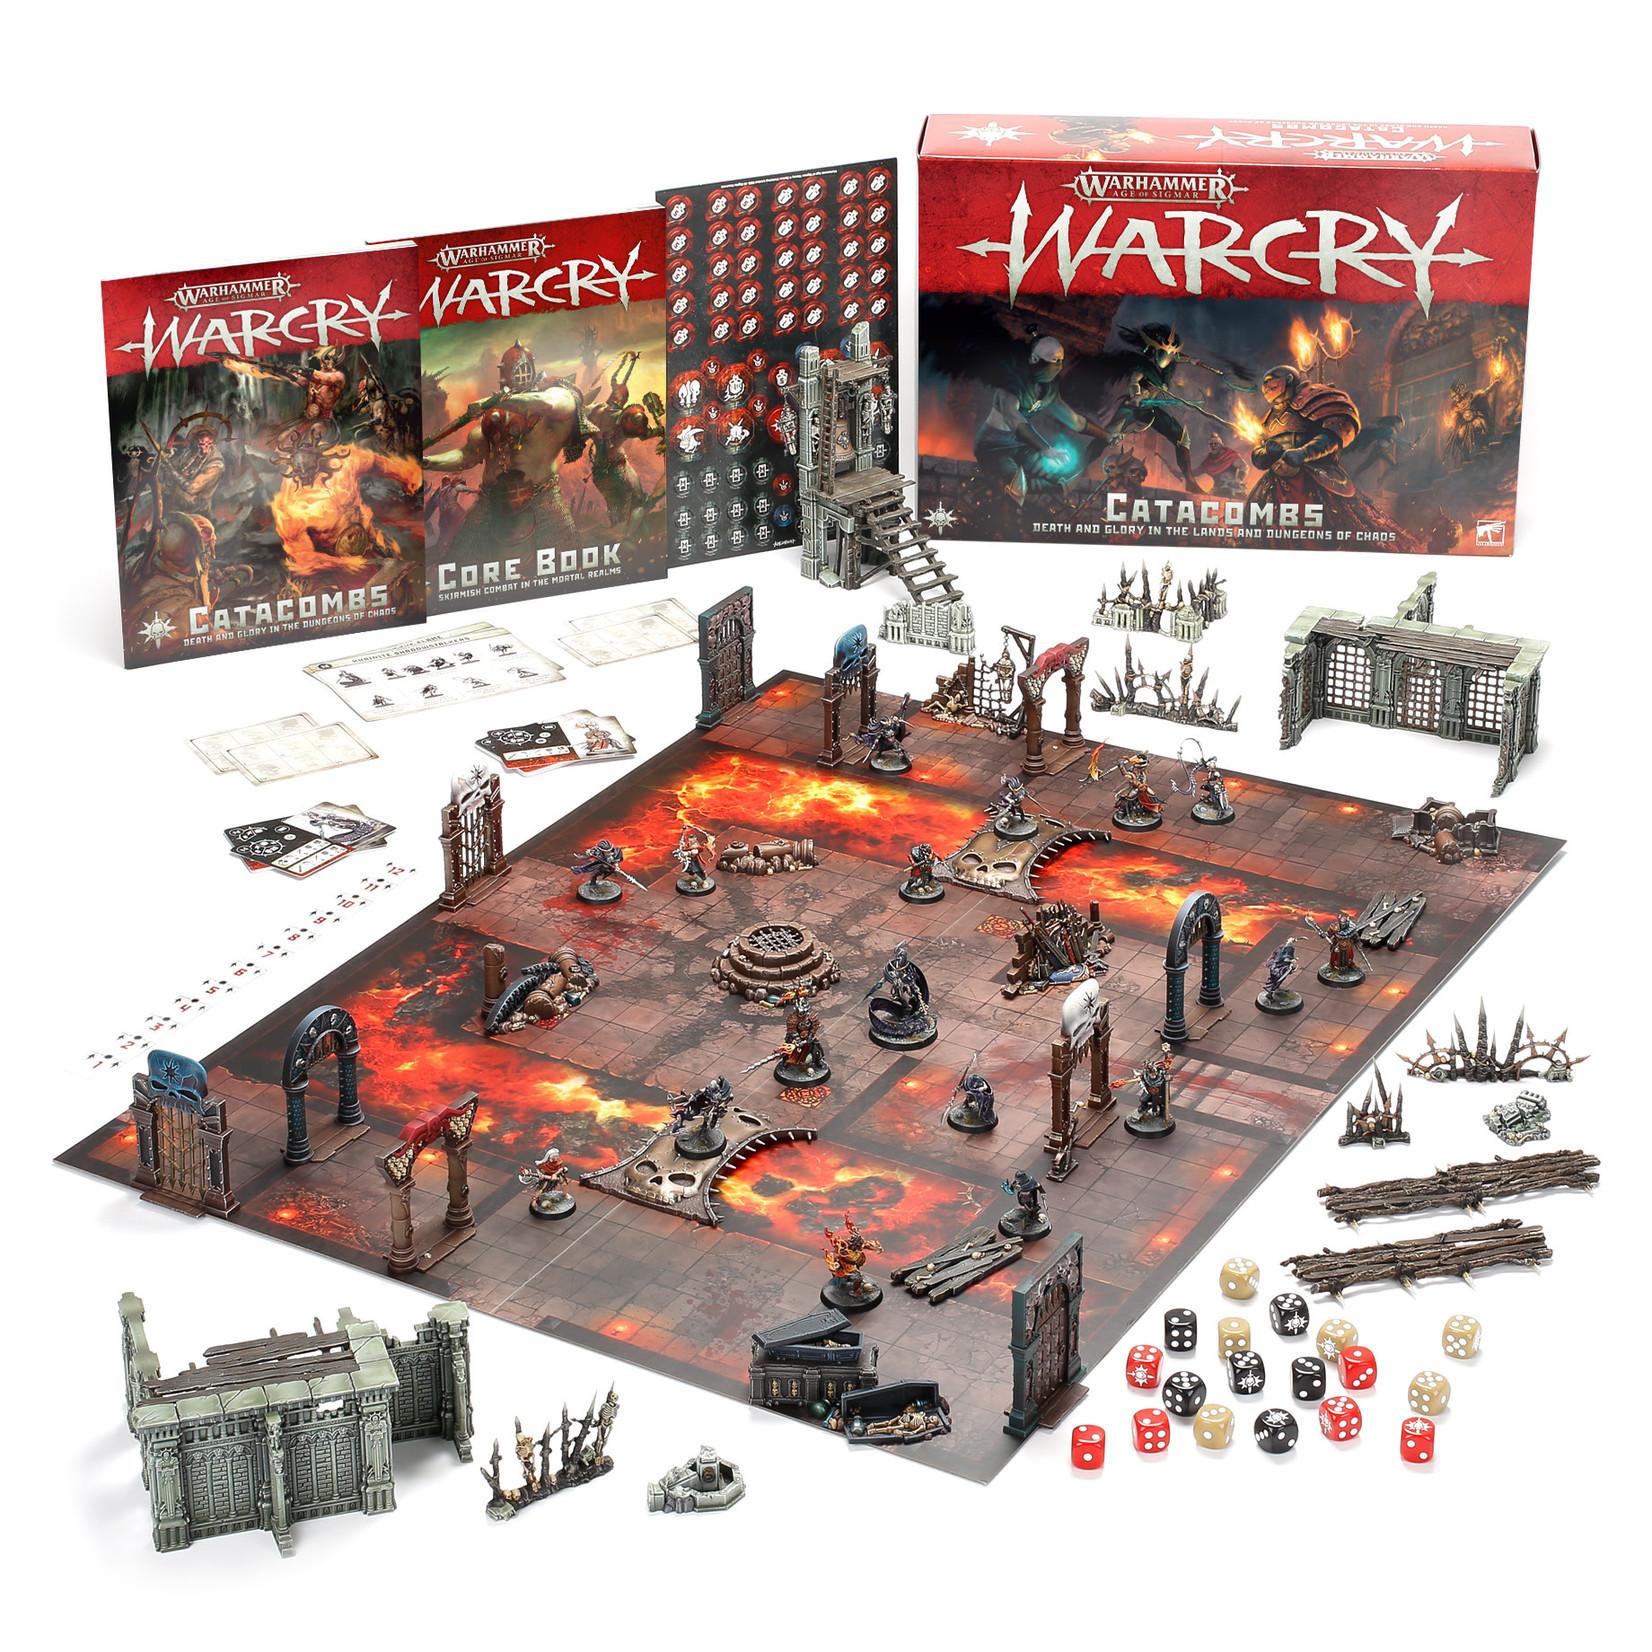 Games Workshop Catacombs Set